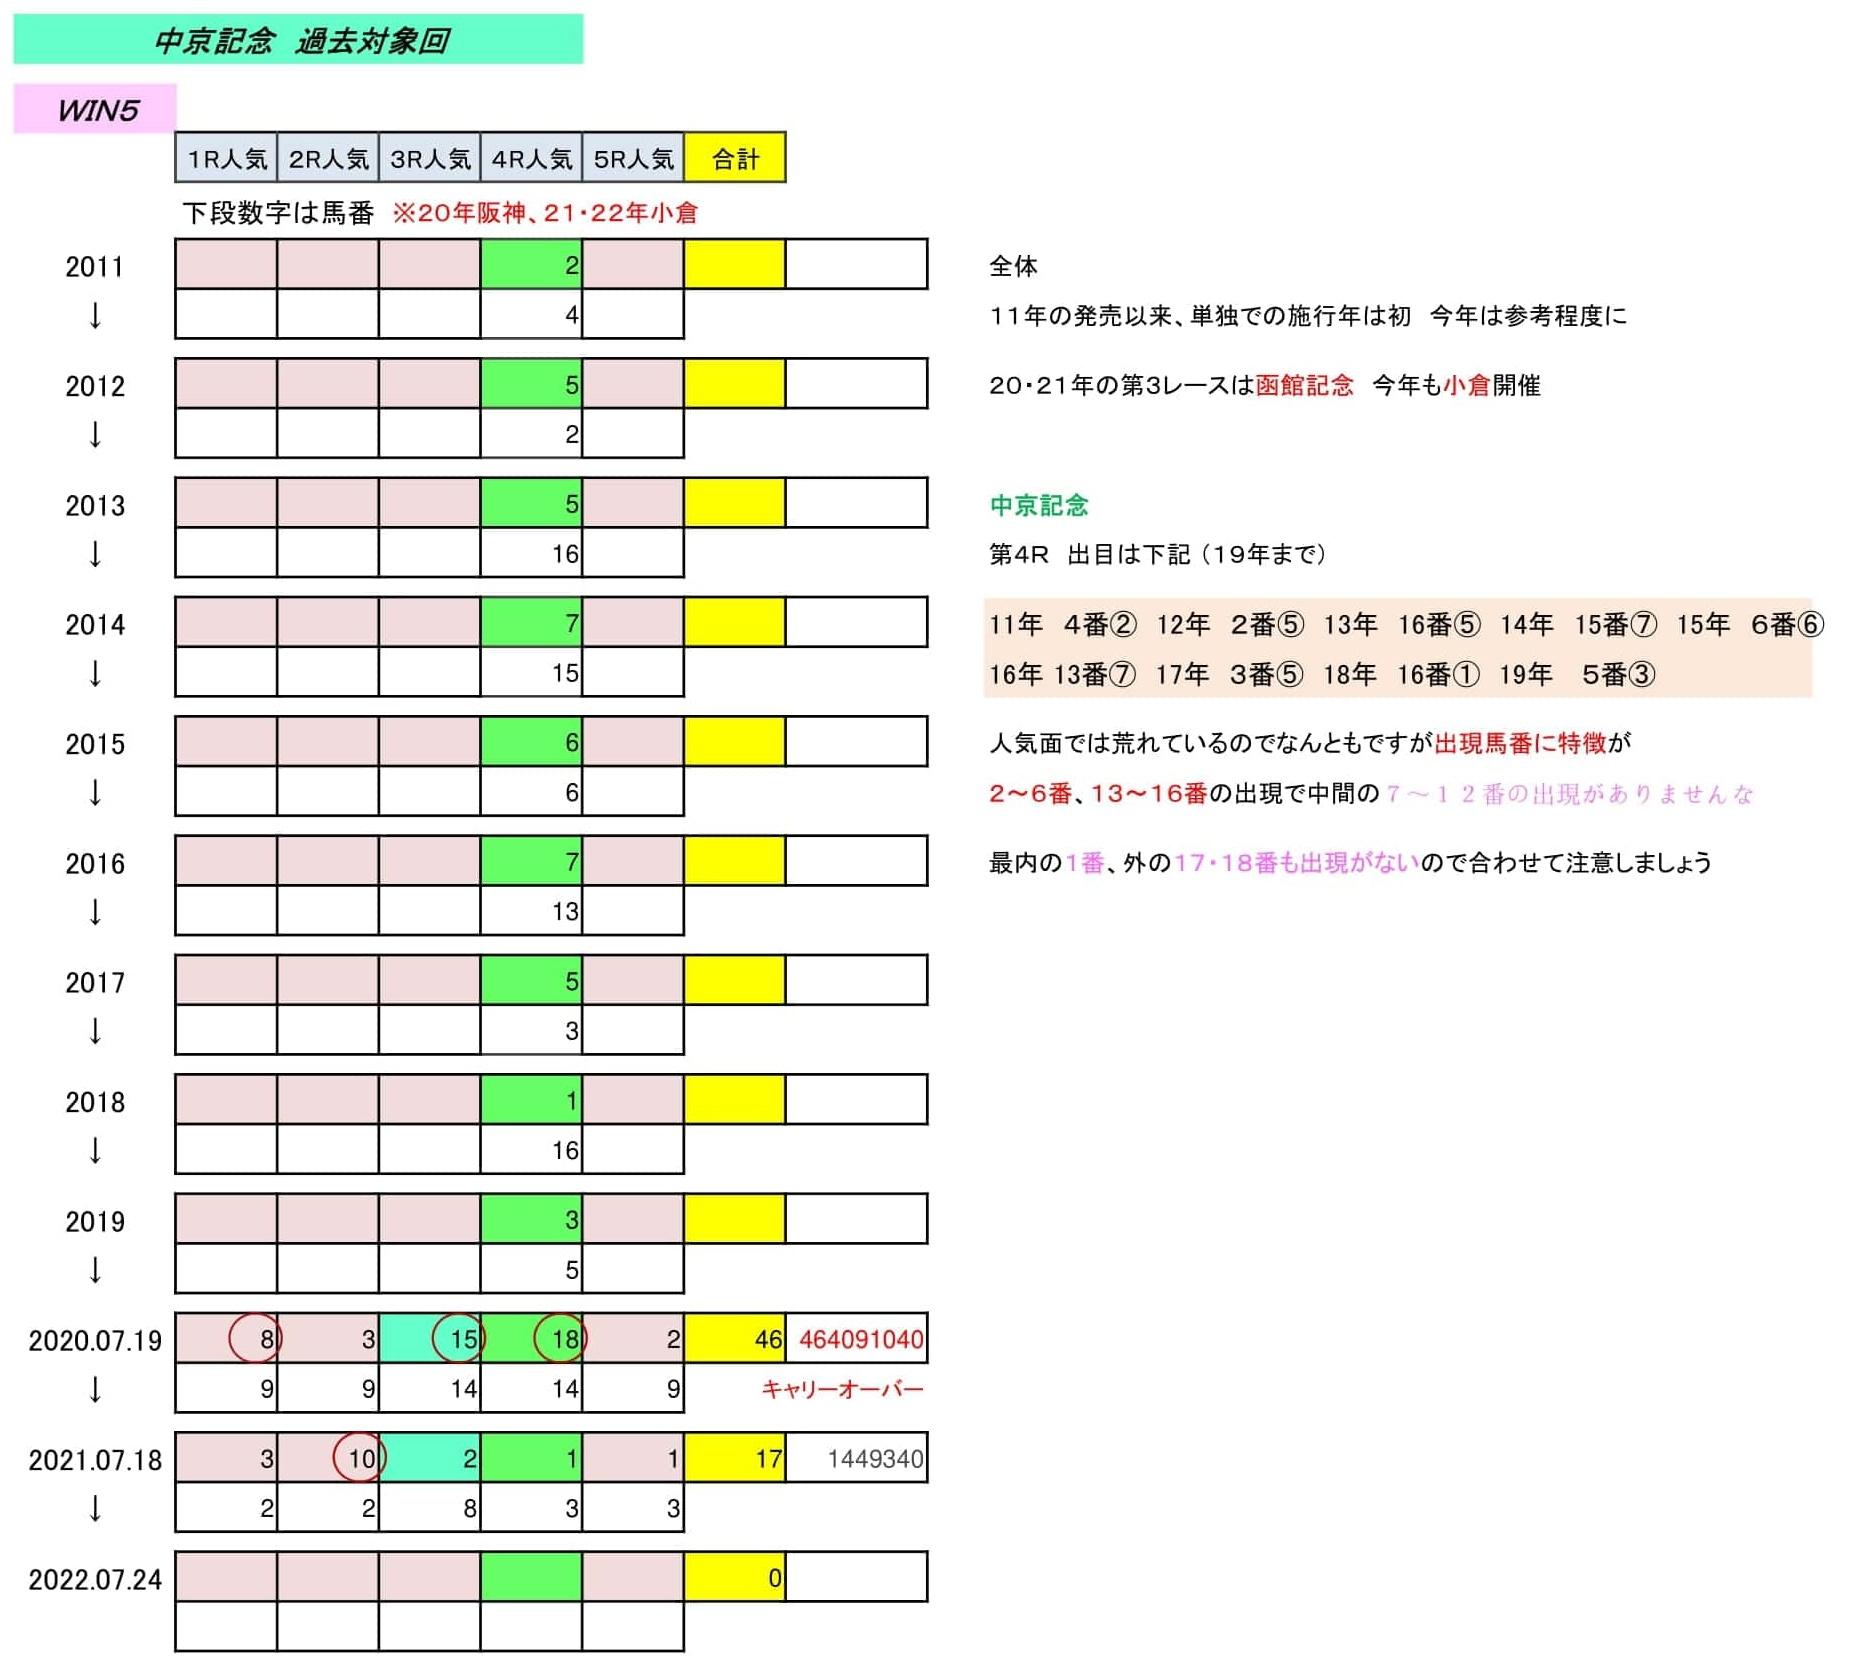 7_24_win5a.jpg